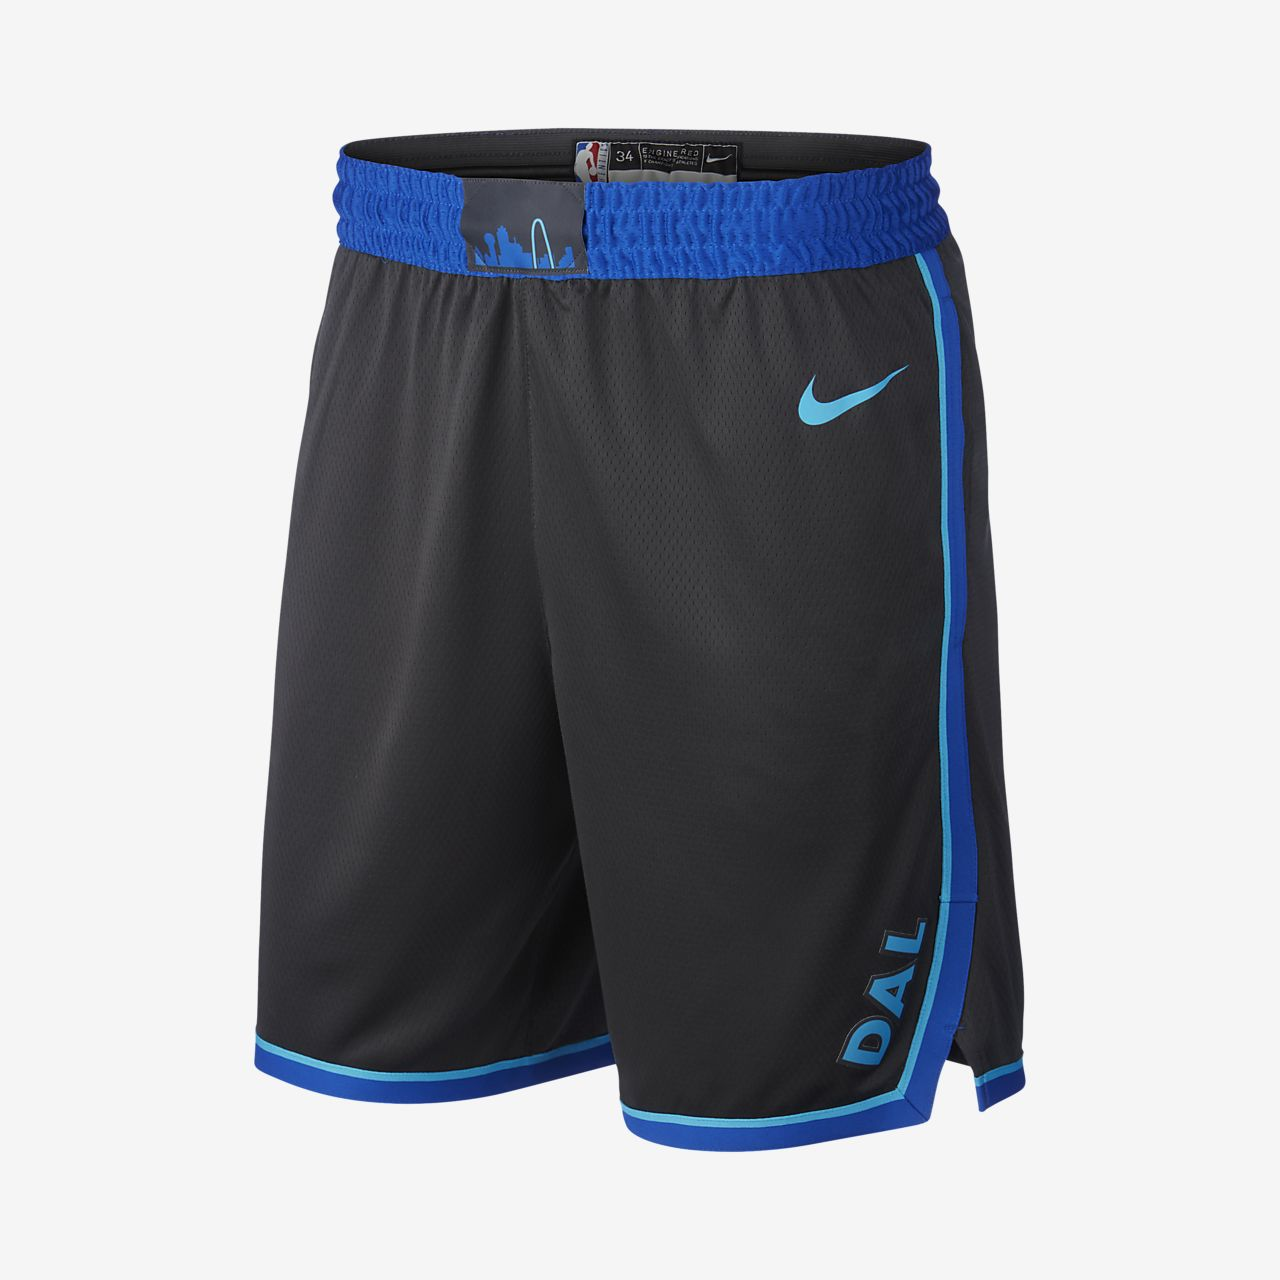 f770549ee Dallas Mavericks City Edition Swingman Men s Nike NBA Shorts. Nike ...